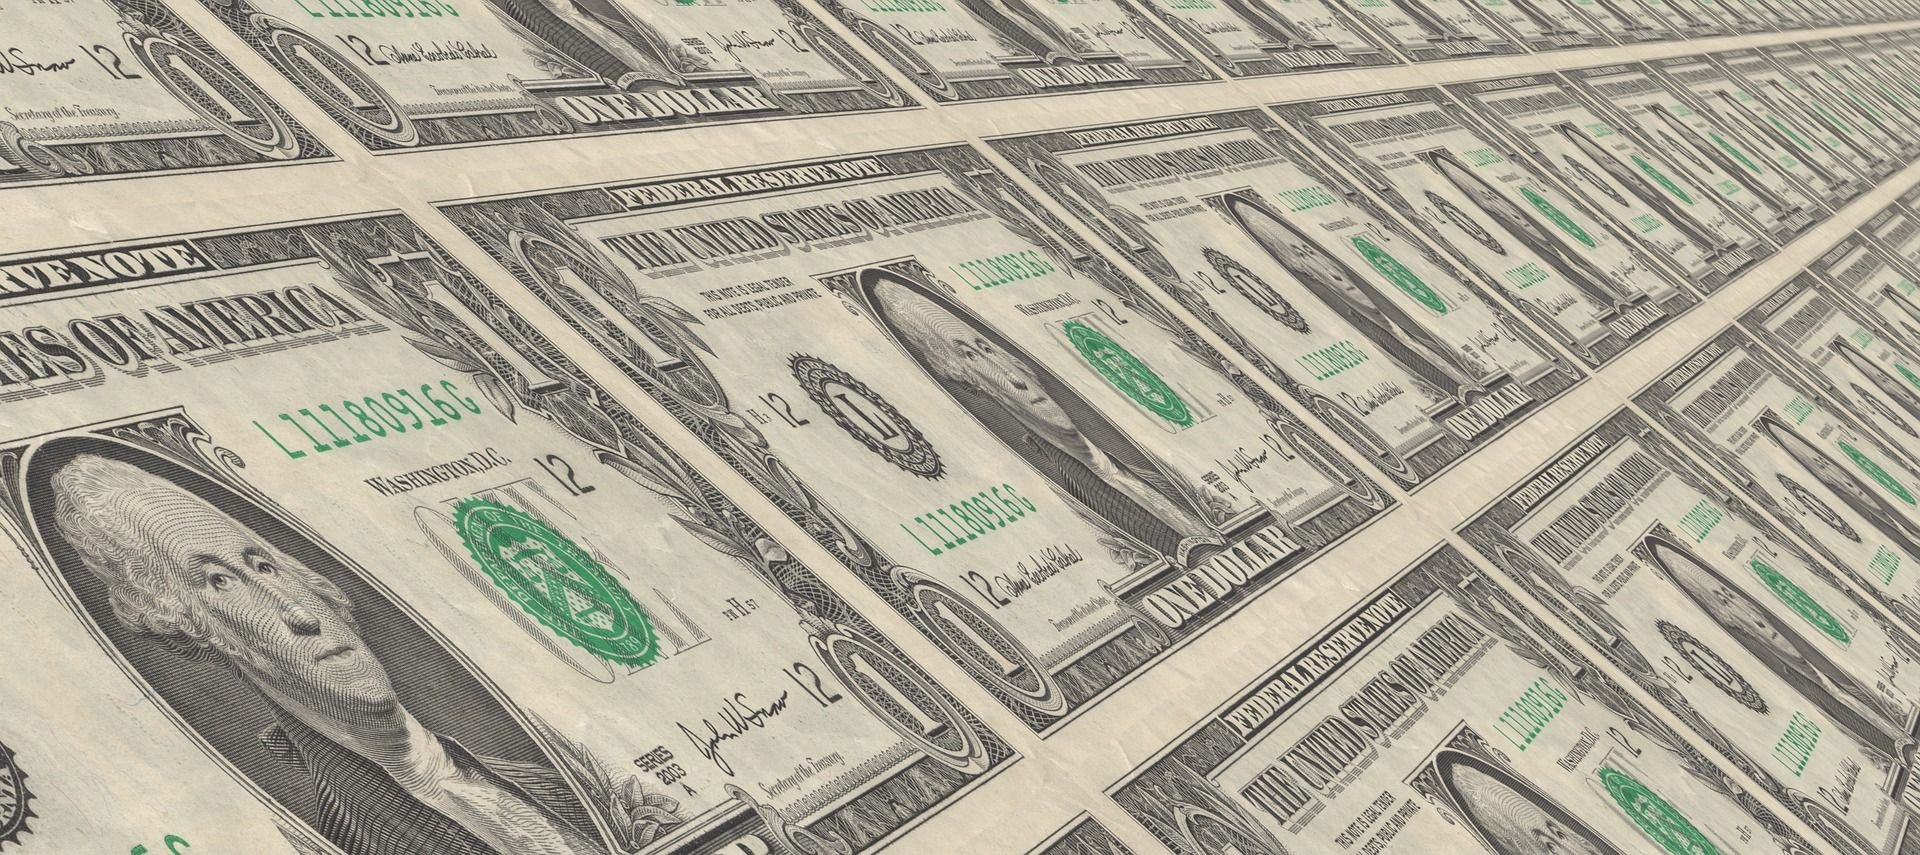 PixaStudio Review: Pricing & Upsells